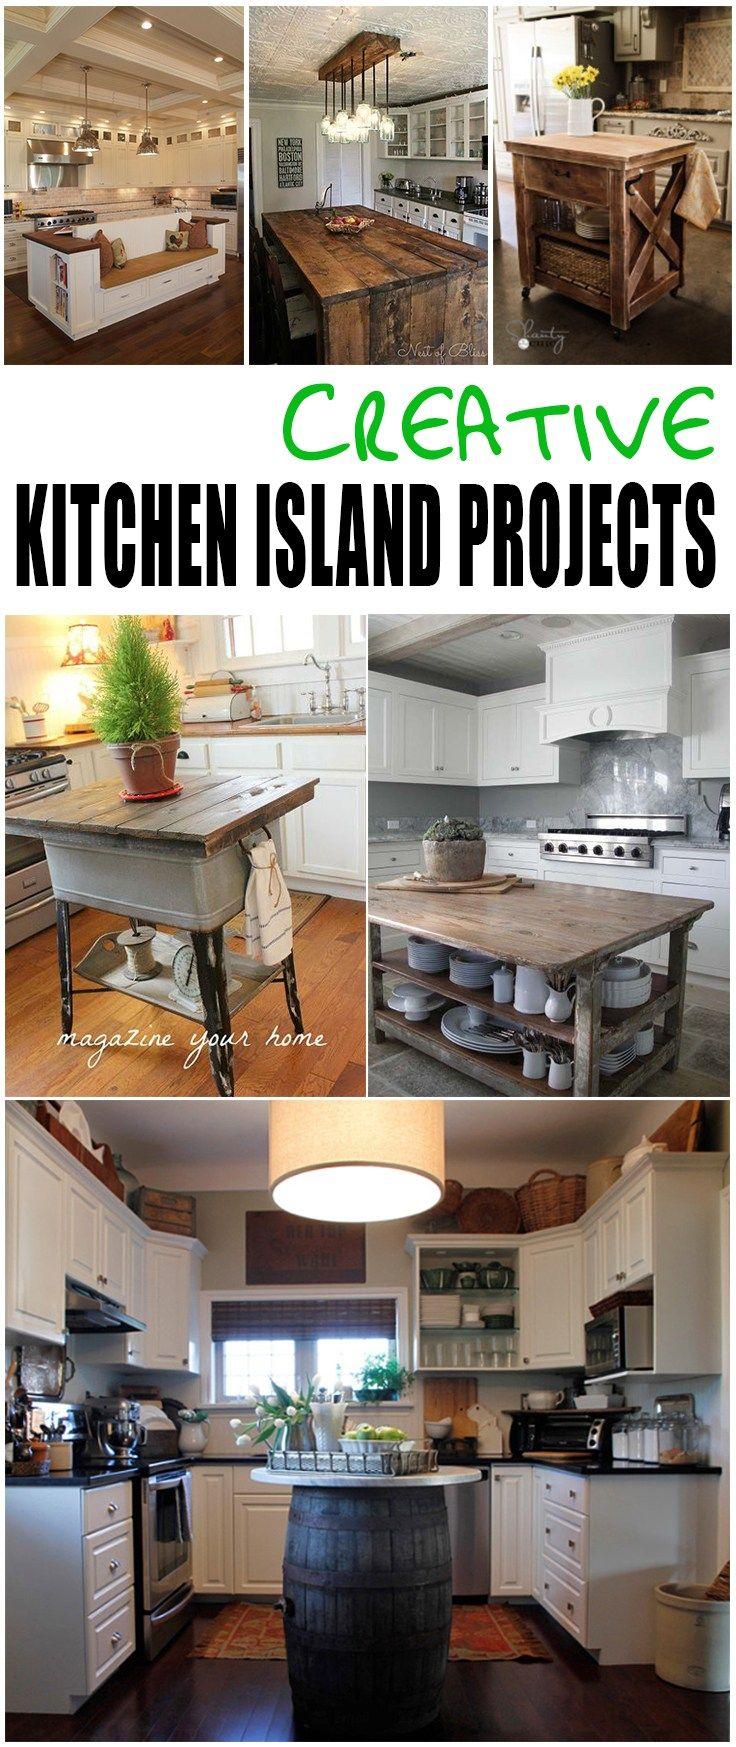 Fullsize Of Kitchen Island Projects